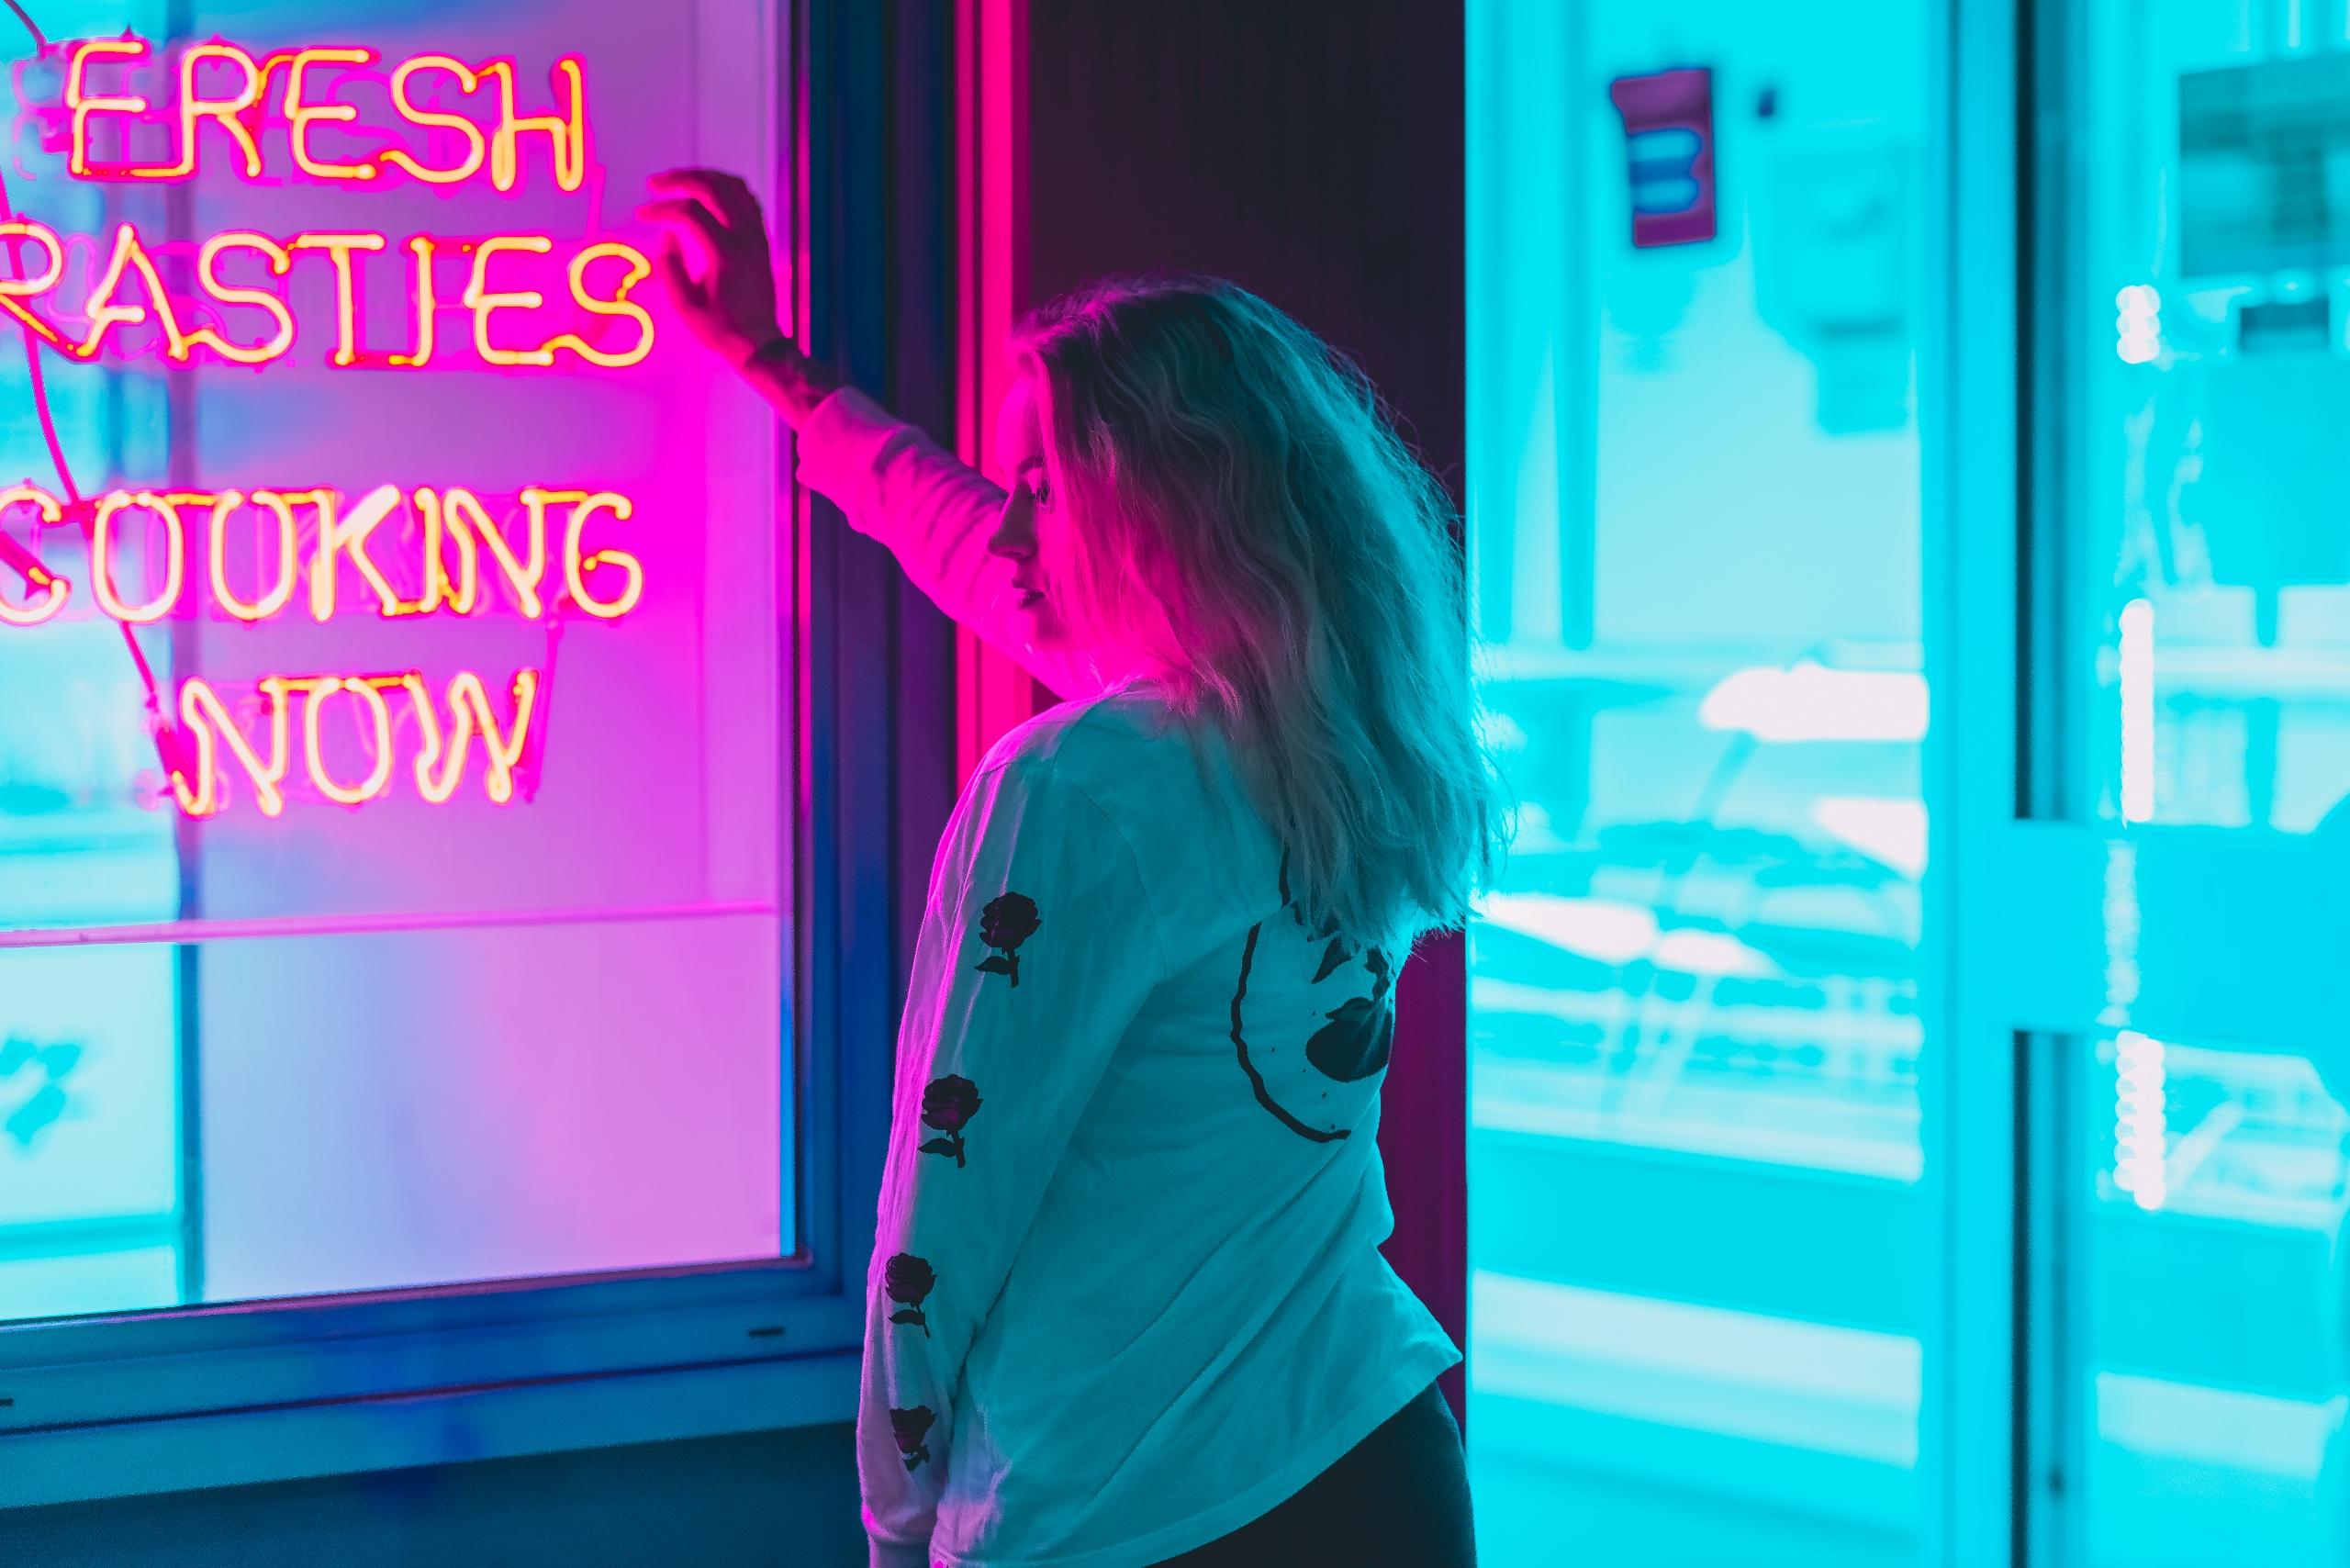 Gemma city nights (2018 - photography - markerwrisberg | ello